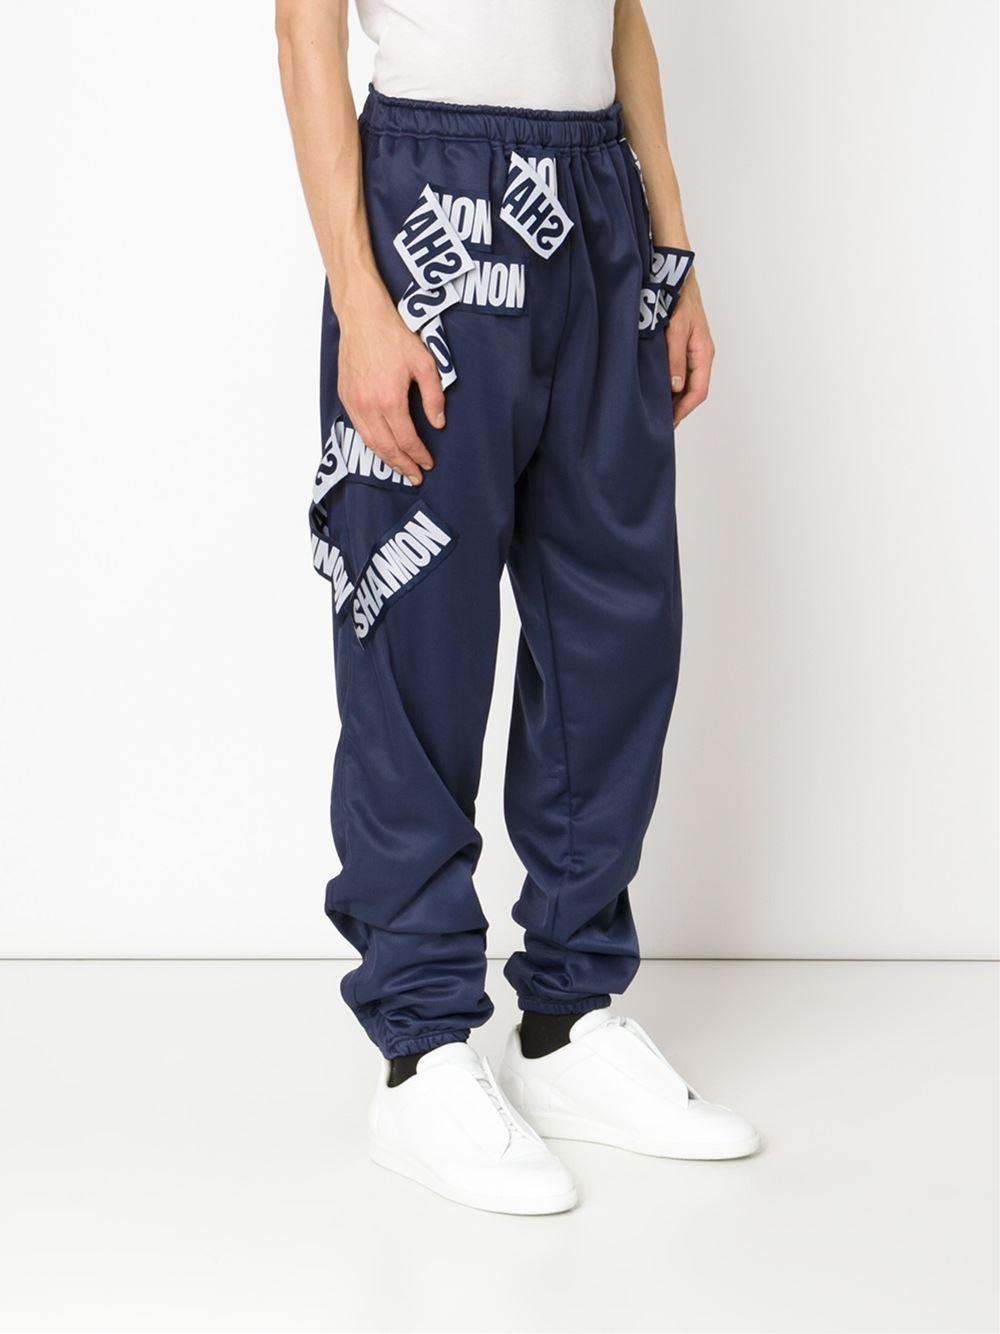 Christopher Shannon Patch Appliqué Trousers in Blue for Men